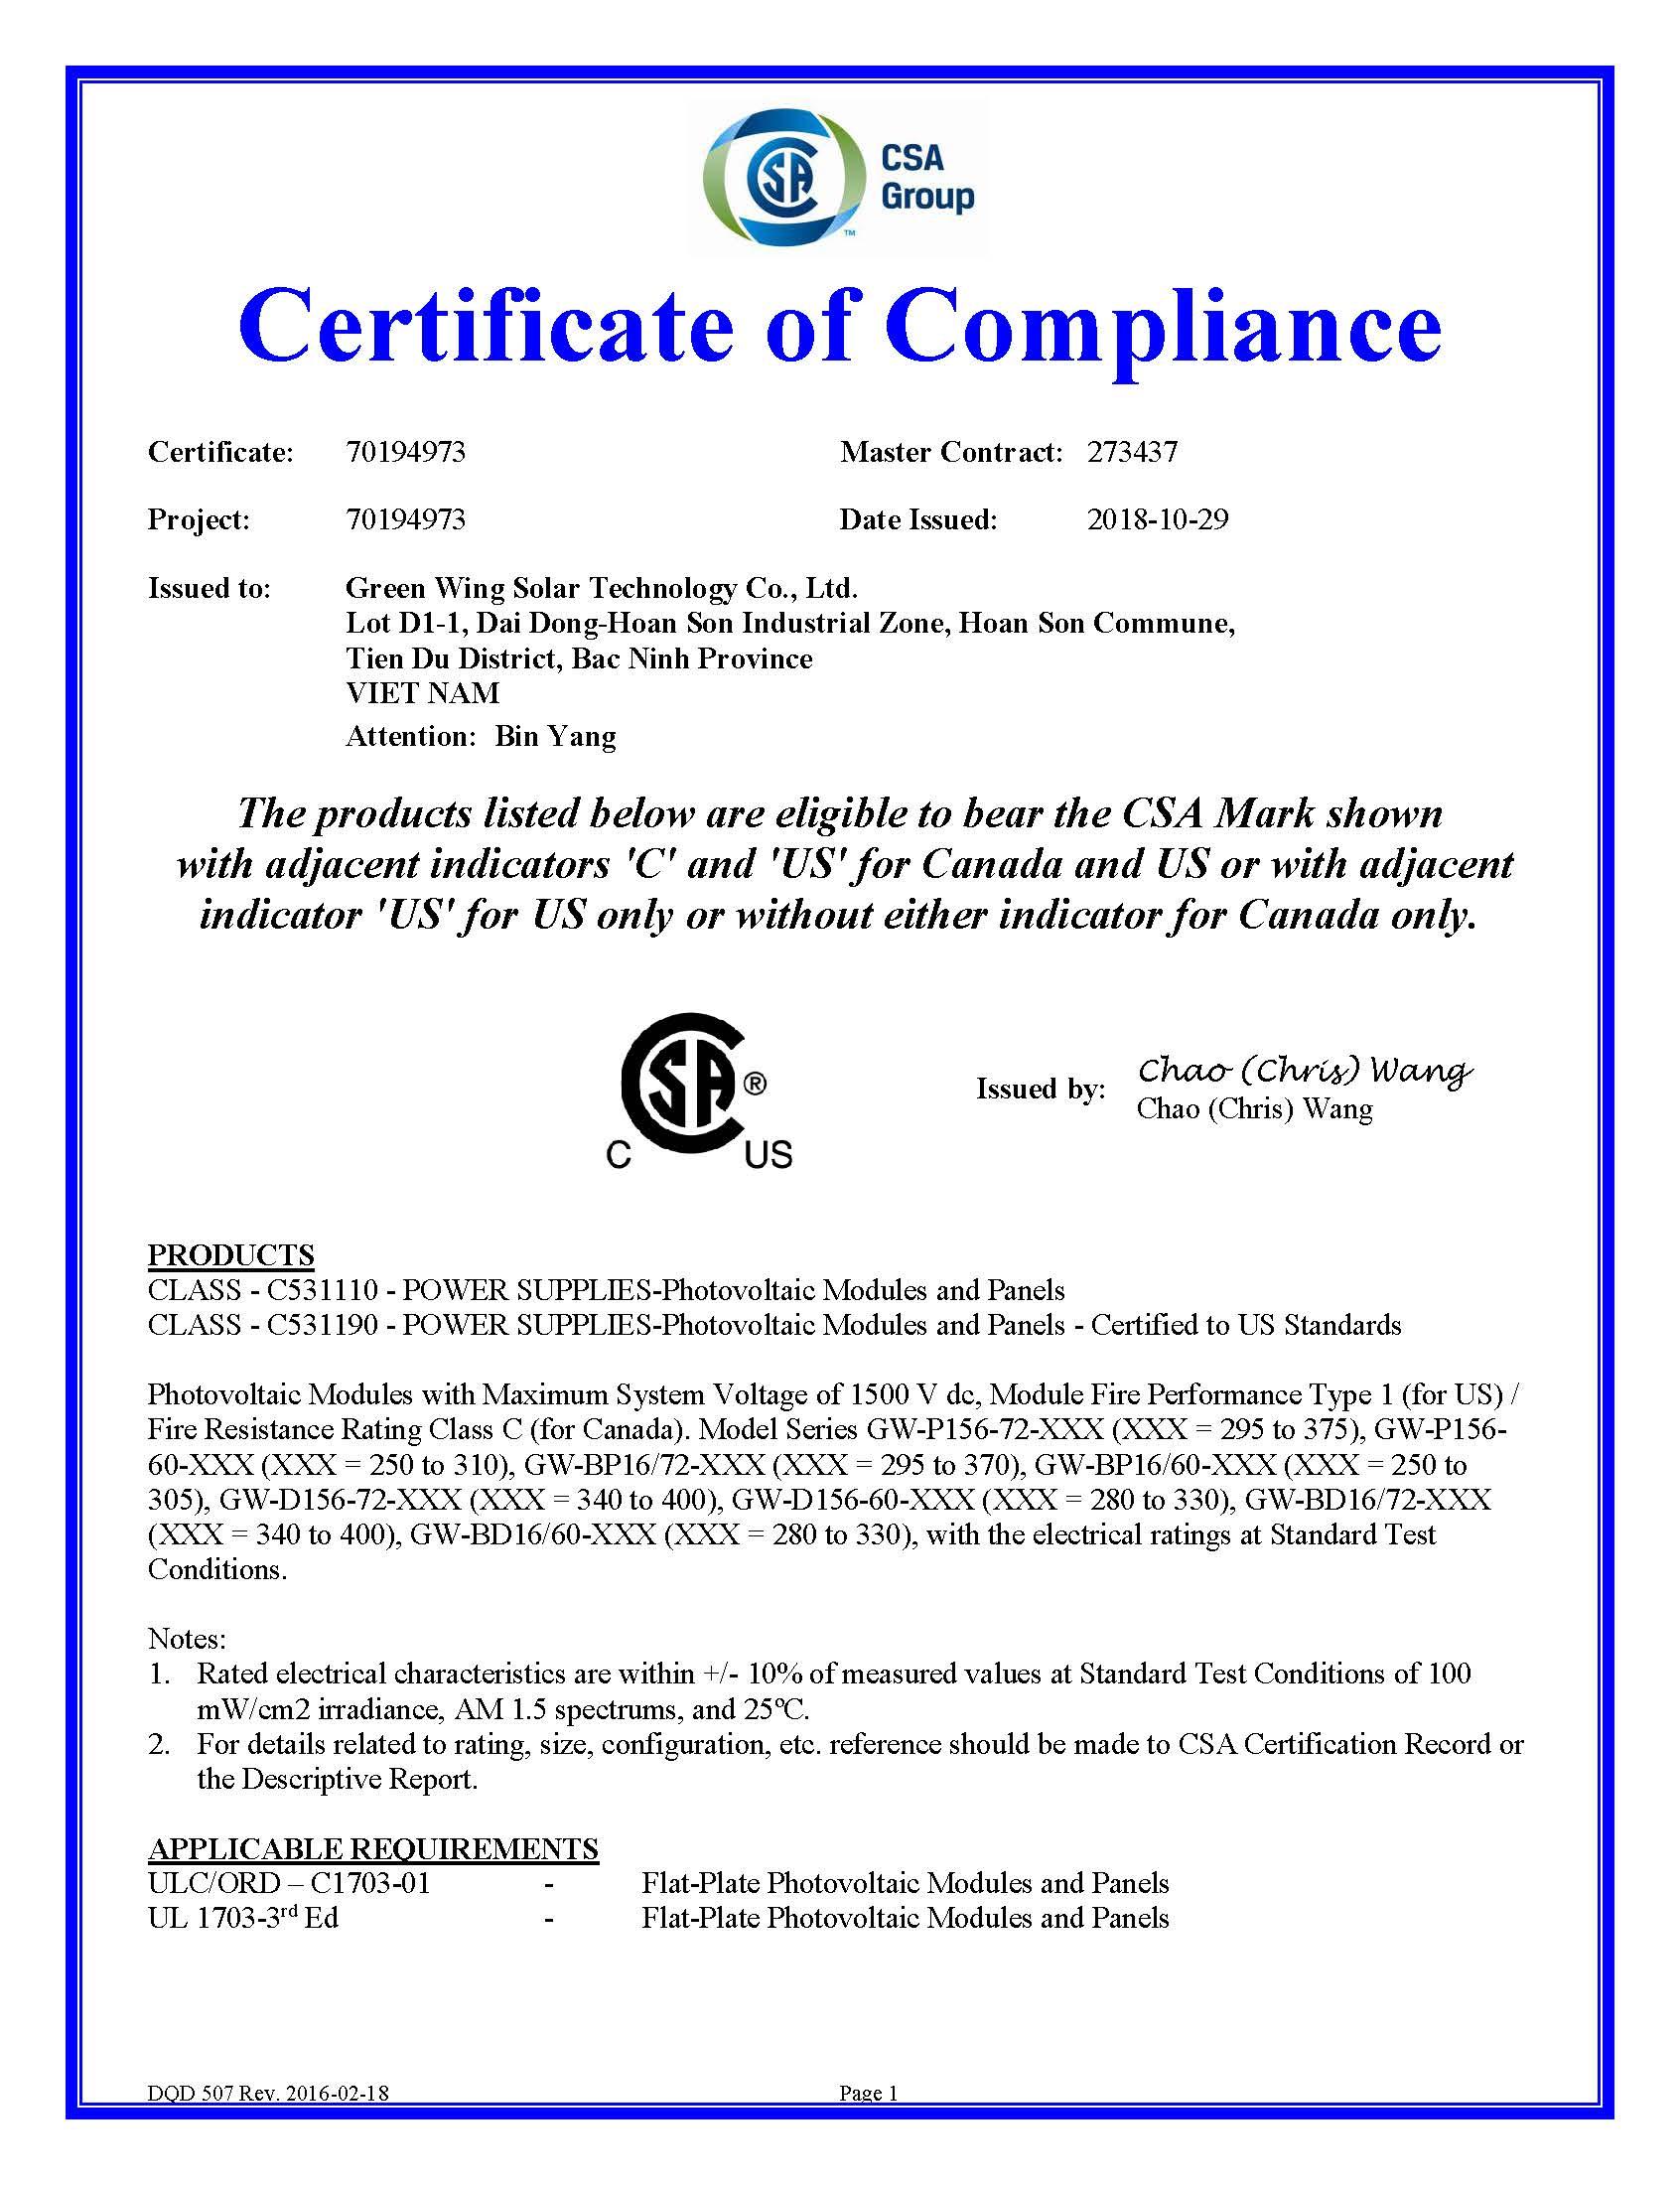 CSA Certificate_页面_1